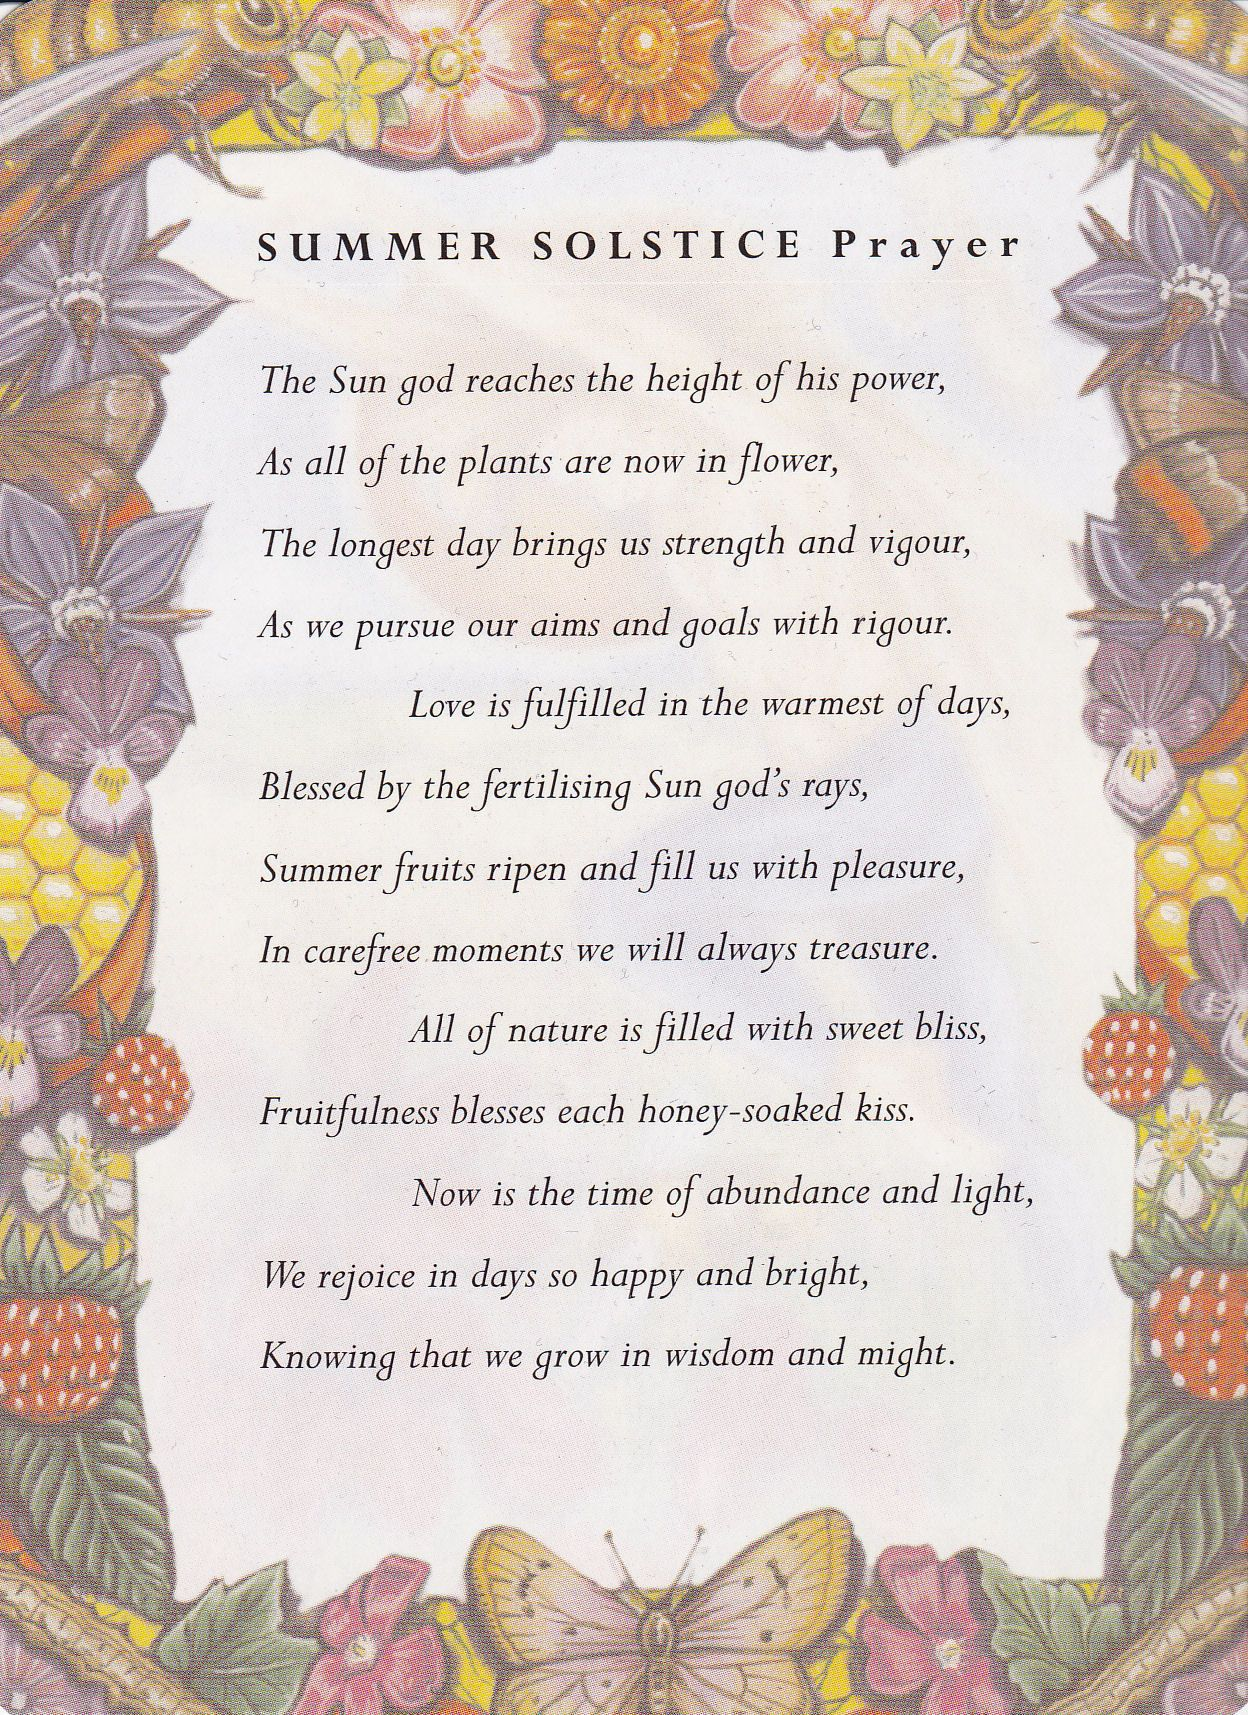 Summer Solstice Prayer